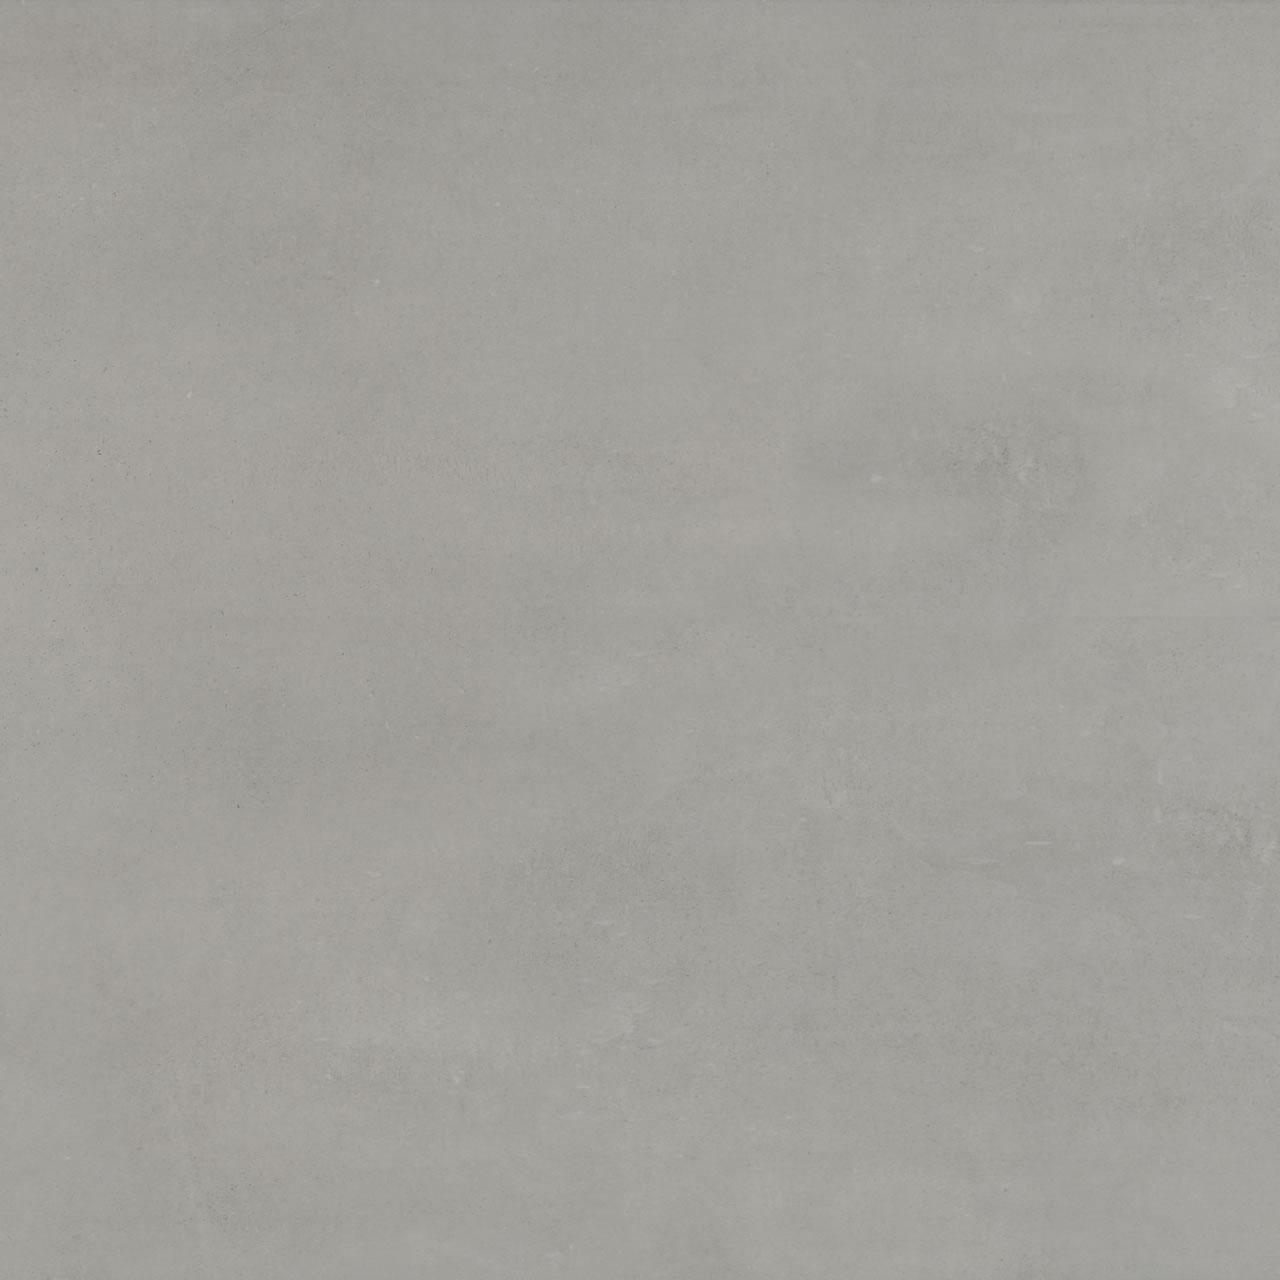 Cemento yuna limpia V AC 60×60